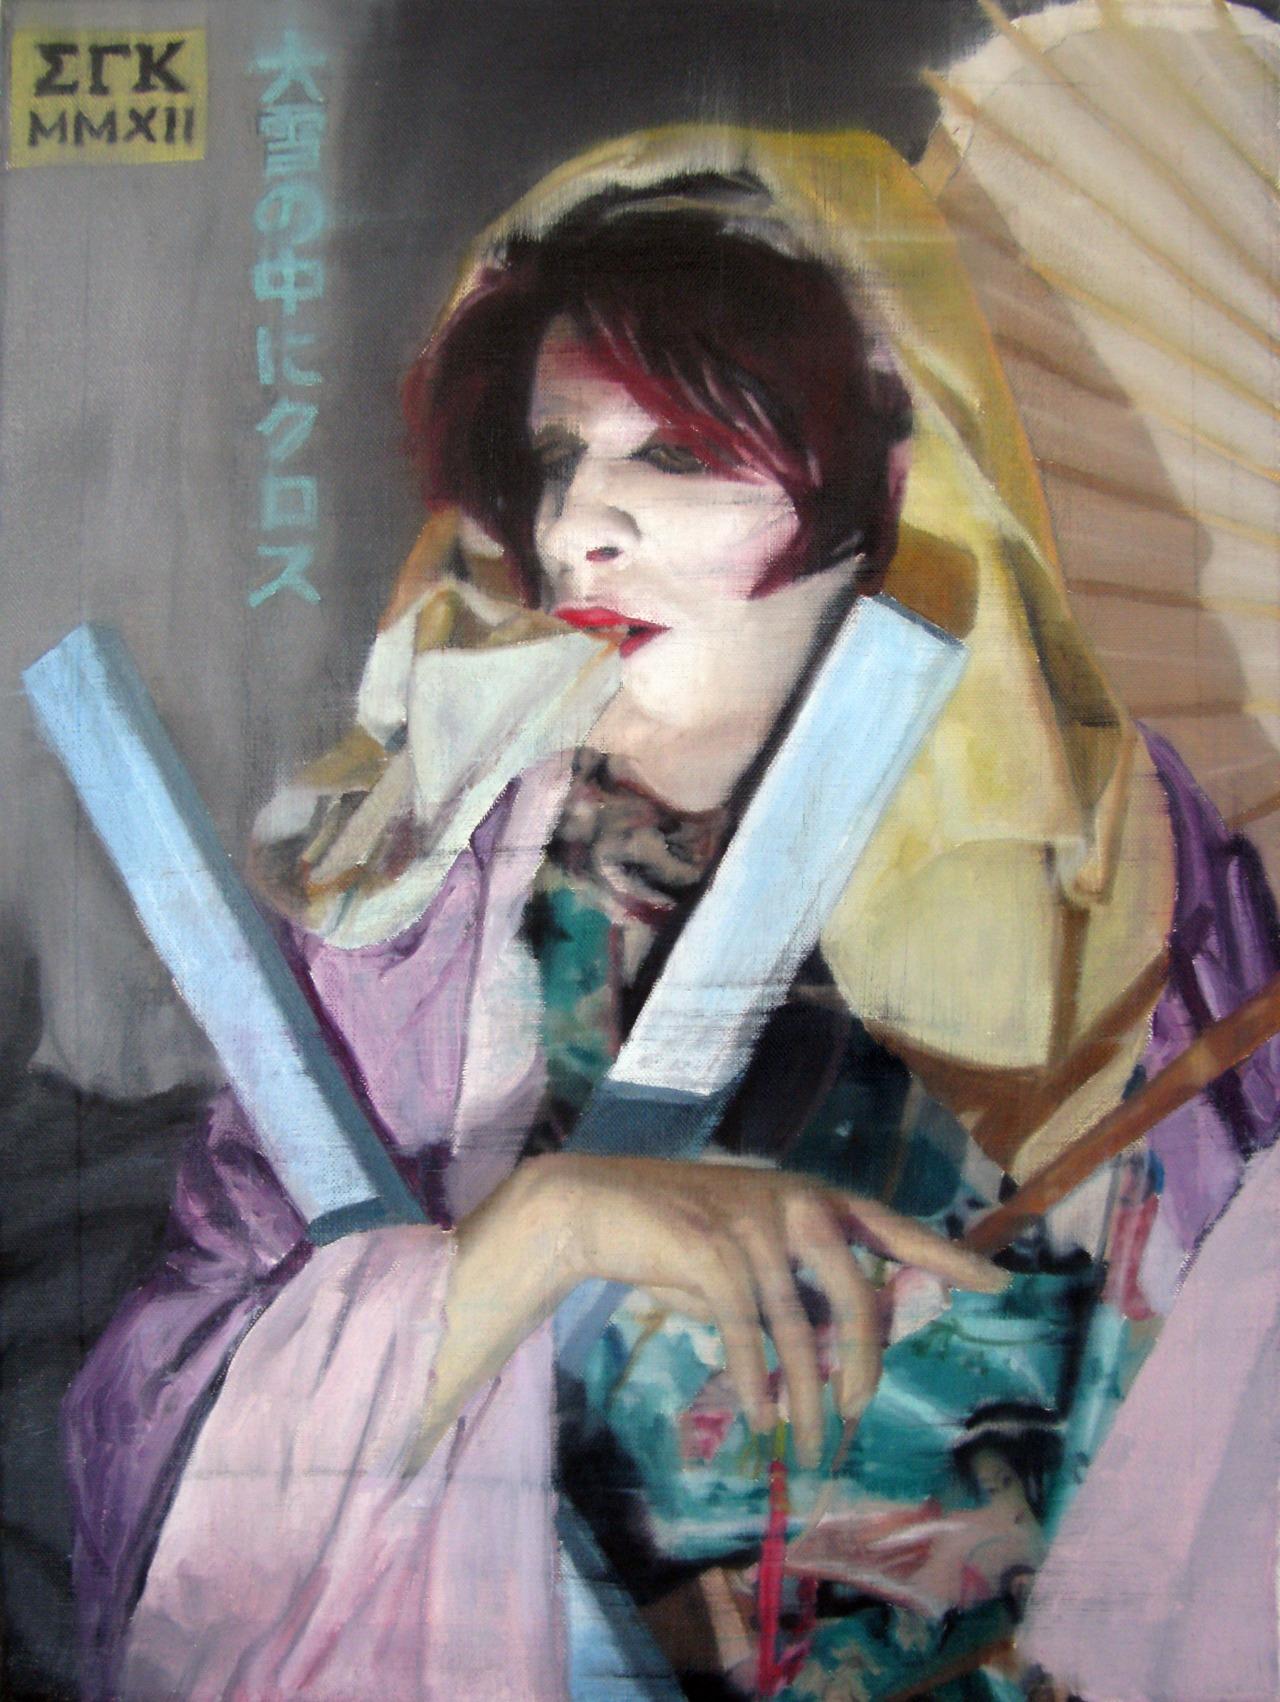 Samuel Quinteros,  Taisetsu no naka ni kurosu  (2012), oil on canvas, 61 x 46 cm. Courtesy the artist.